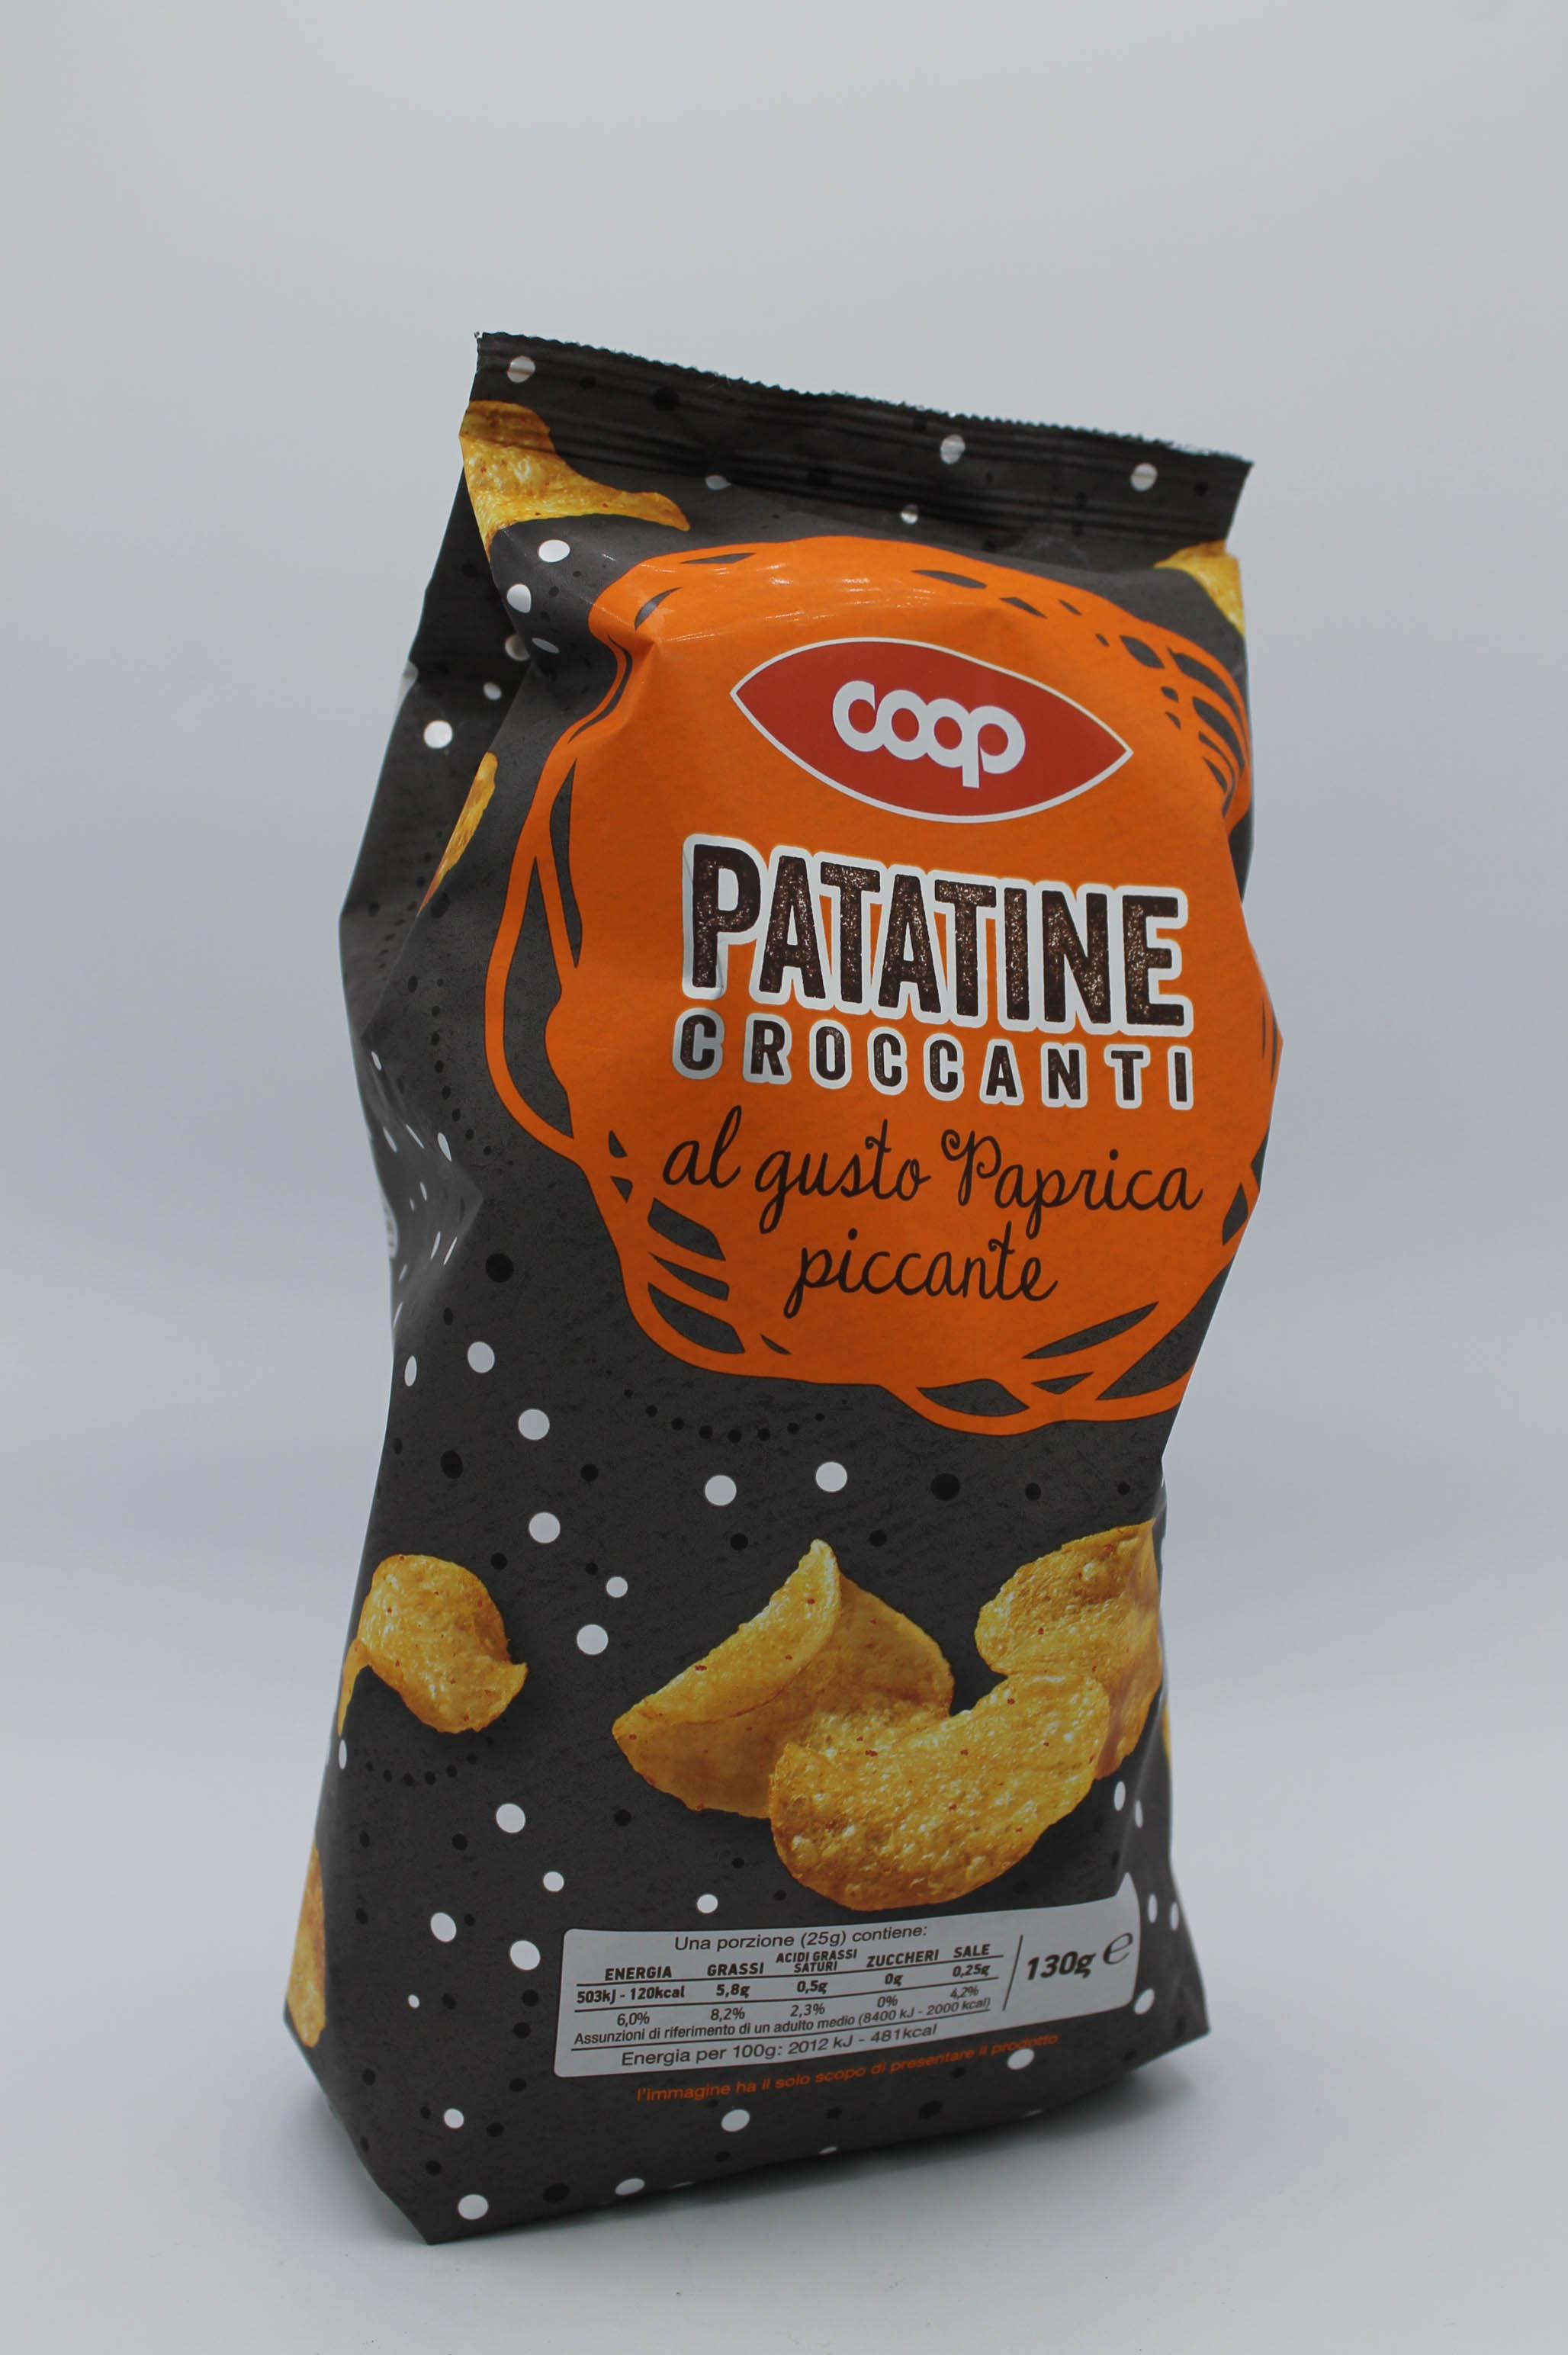 Coop patatine croccanti paprika 130gr.